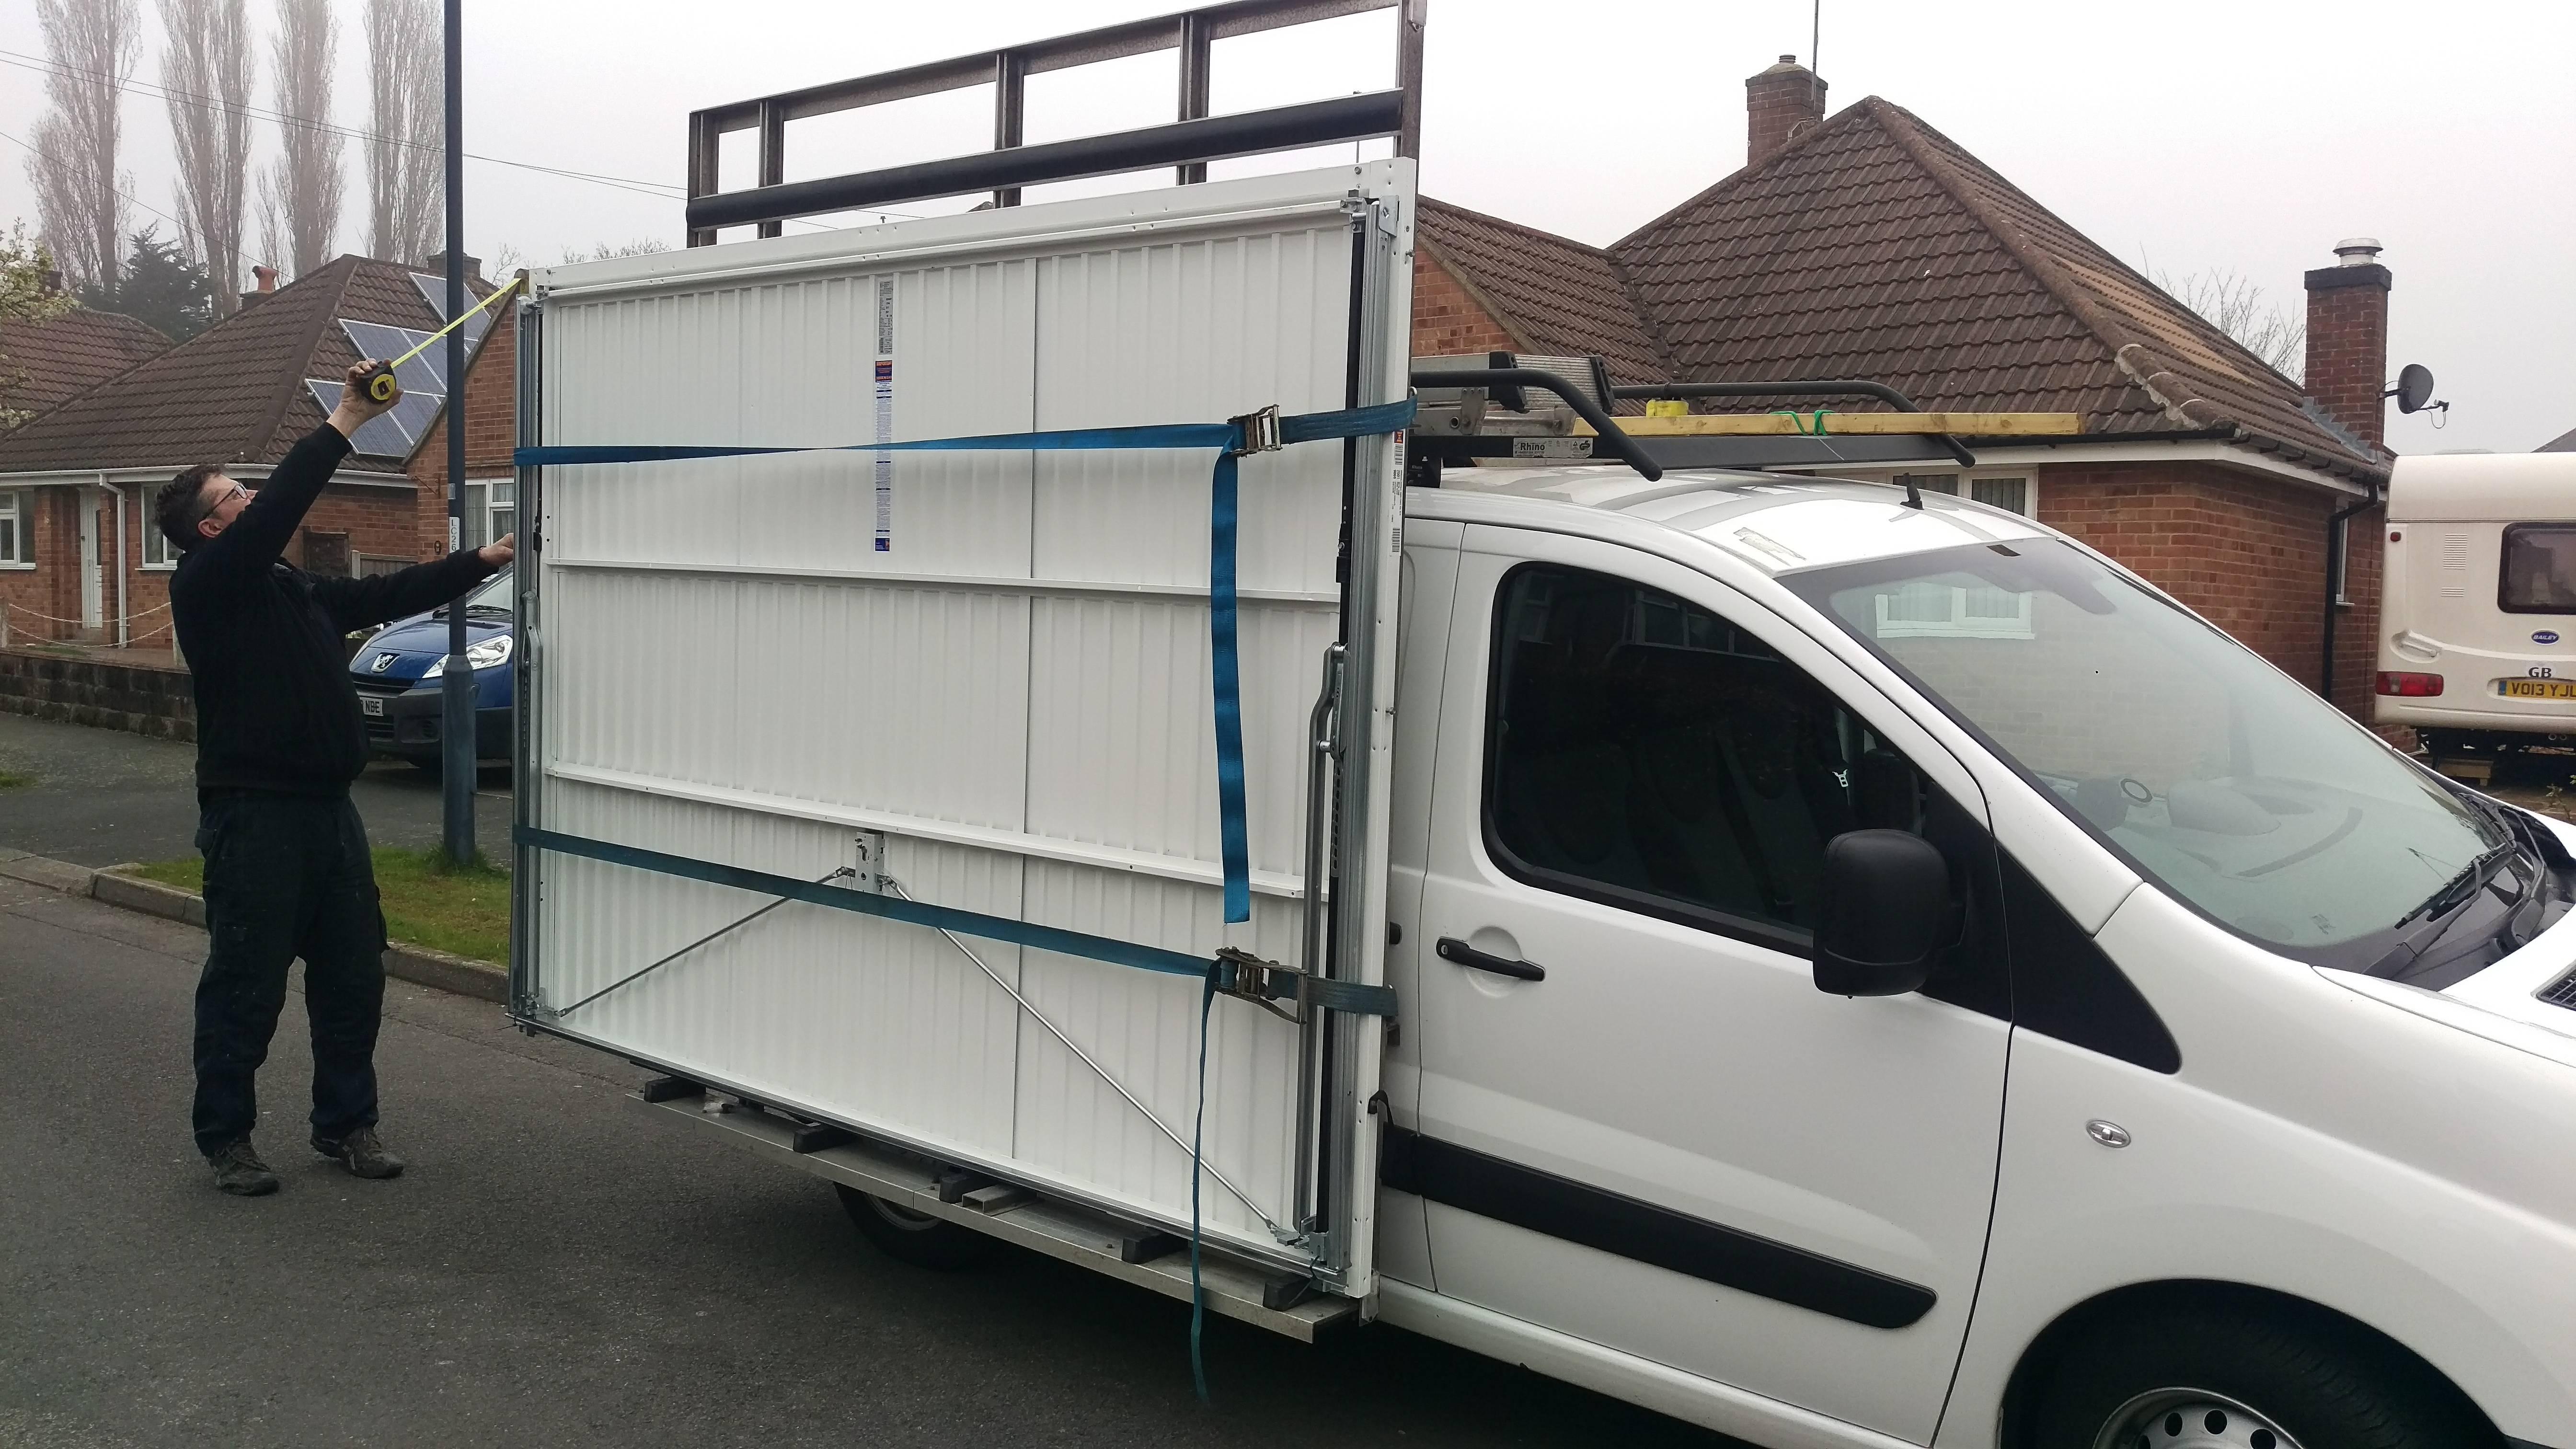 dimensions opener troubleshooting security door garage chamberlain automatic doors overhead regard with company x to plus repair